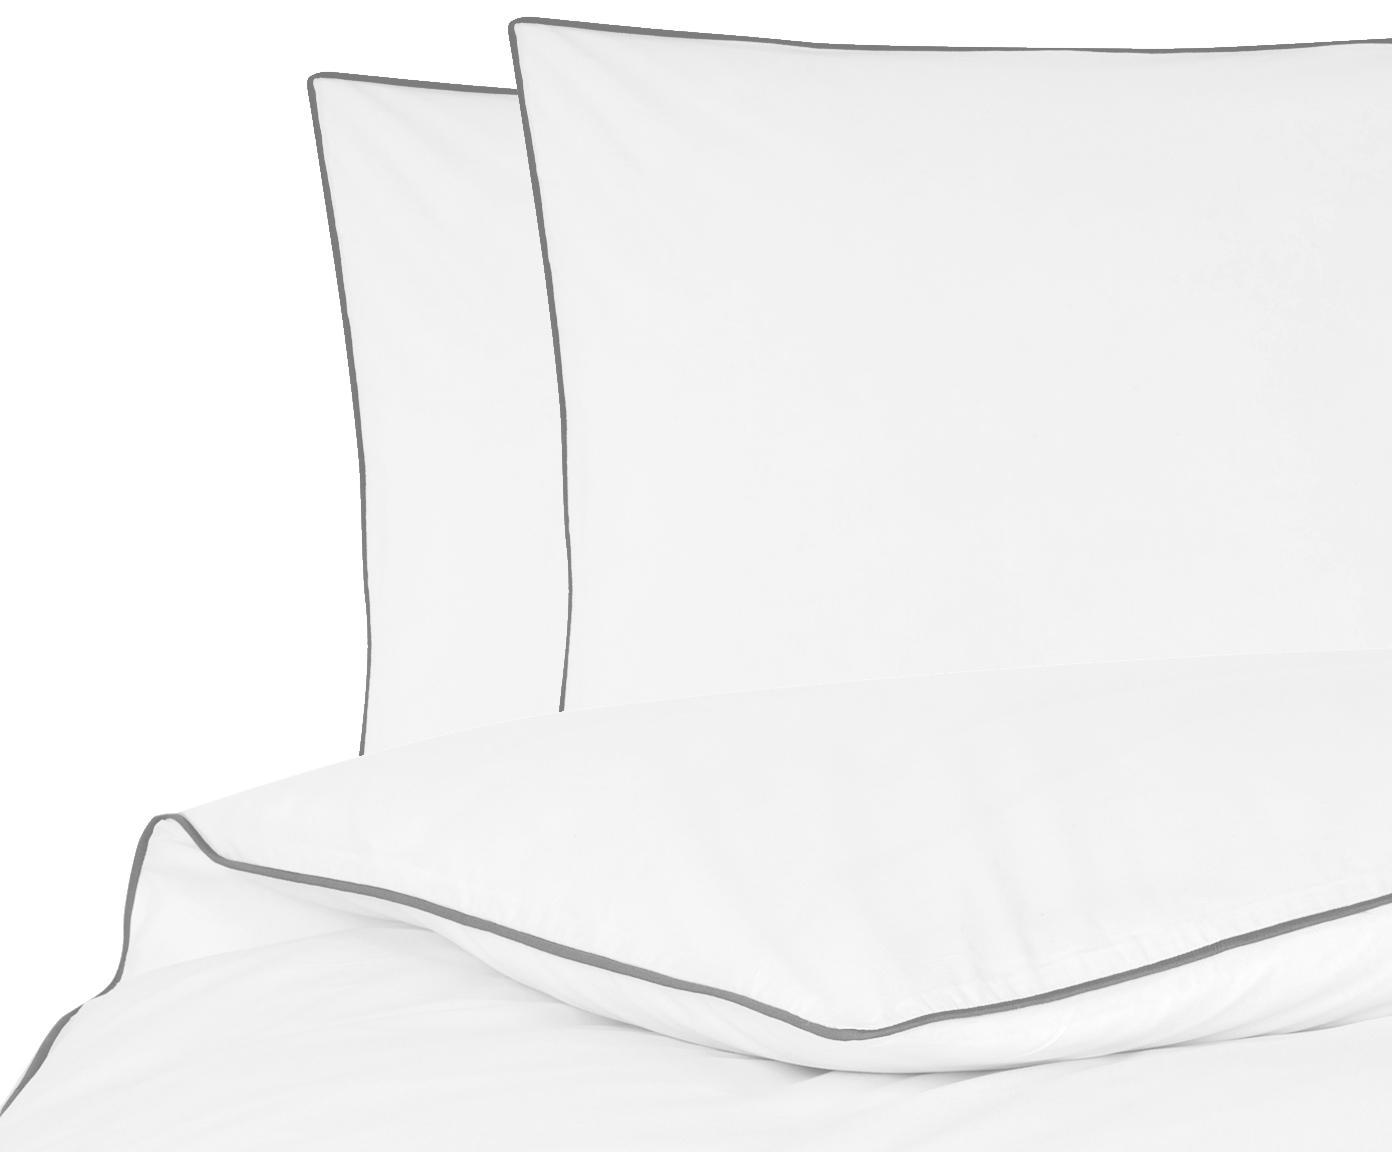 Baumwollperkal-Bettwäsche Daria in Weiß mit Keder, Webart: Perkal Fadendichte 200 TC, Weiß Kederumrandung: Dunkelgrau, 200 x 200 cm + 2 Kissen 80 x 80 cm